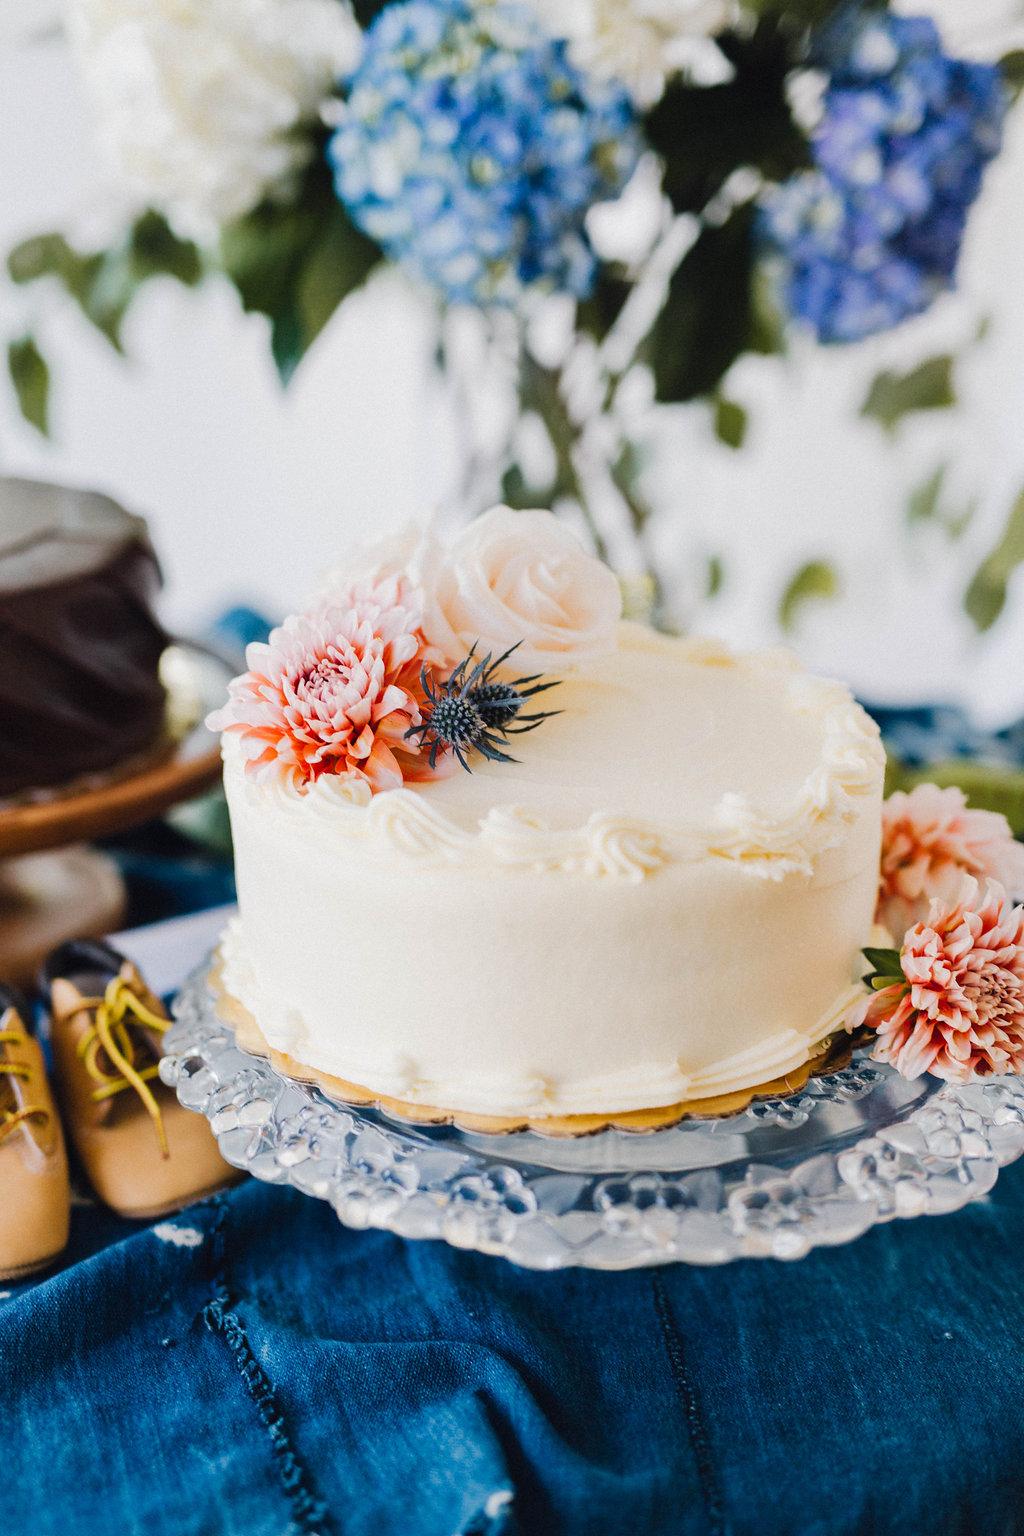 Freeport Bakery Baby Shower Cakes